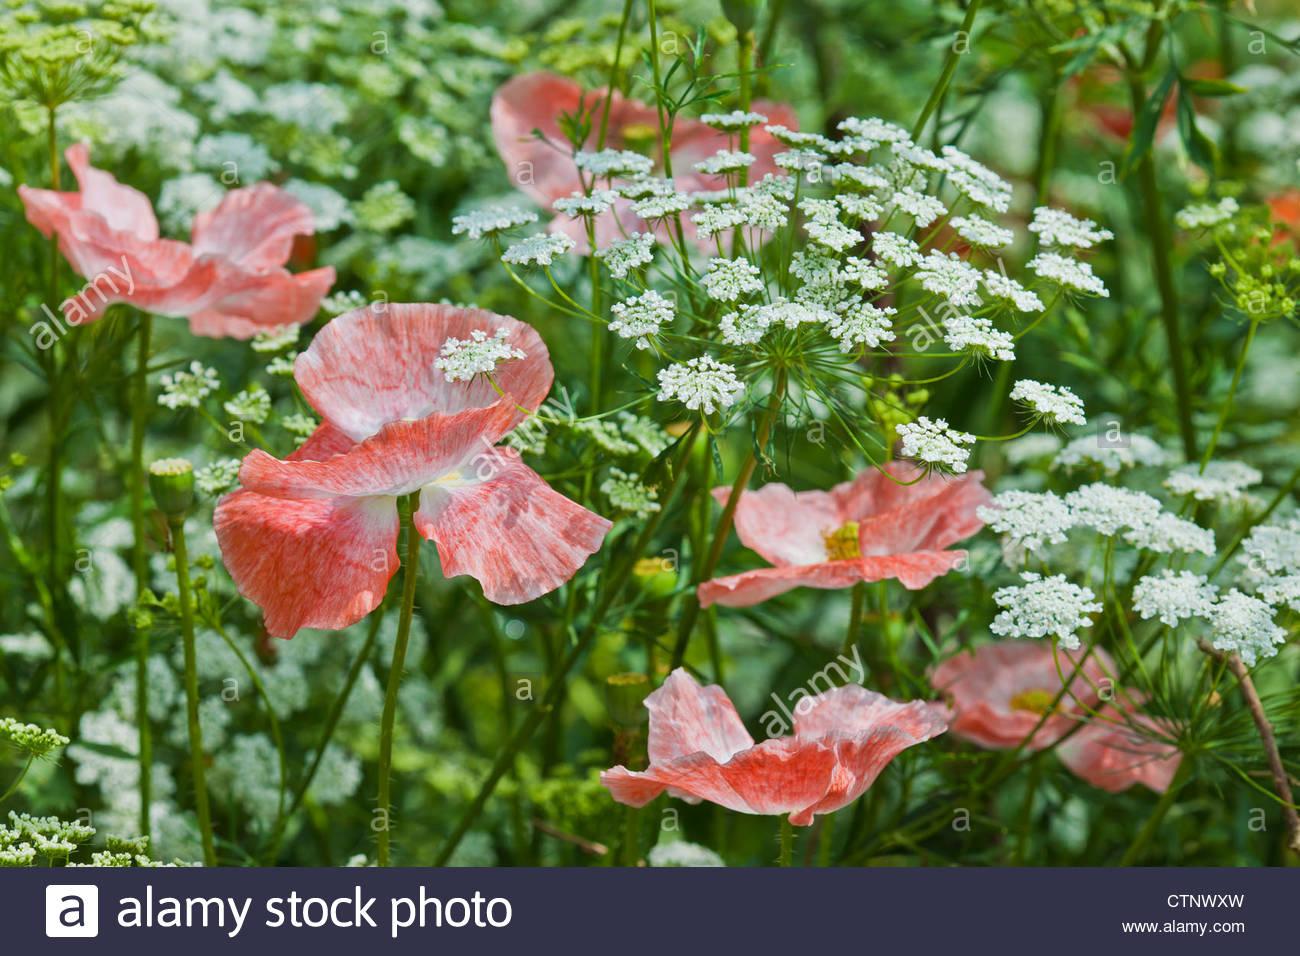 summer flowering stockfotos summer flowering bilder alamy. Black Bedroom Furniture Sets. Home Design Ideas